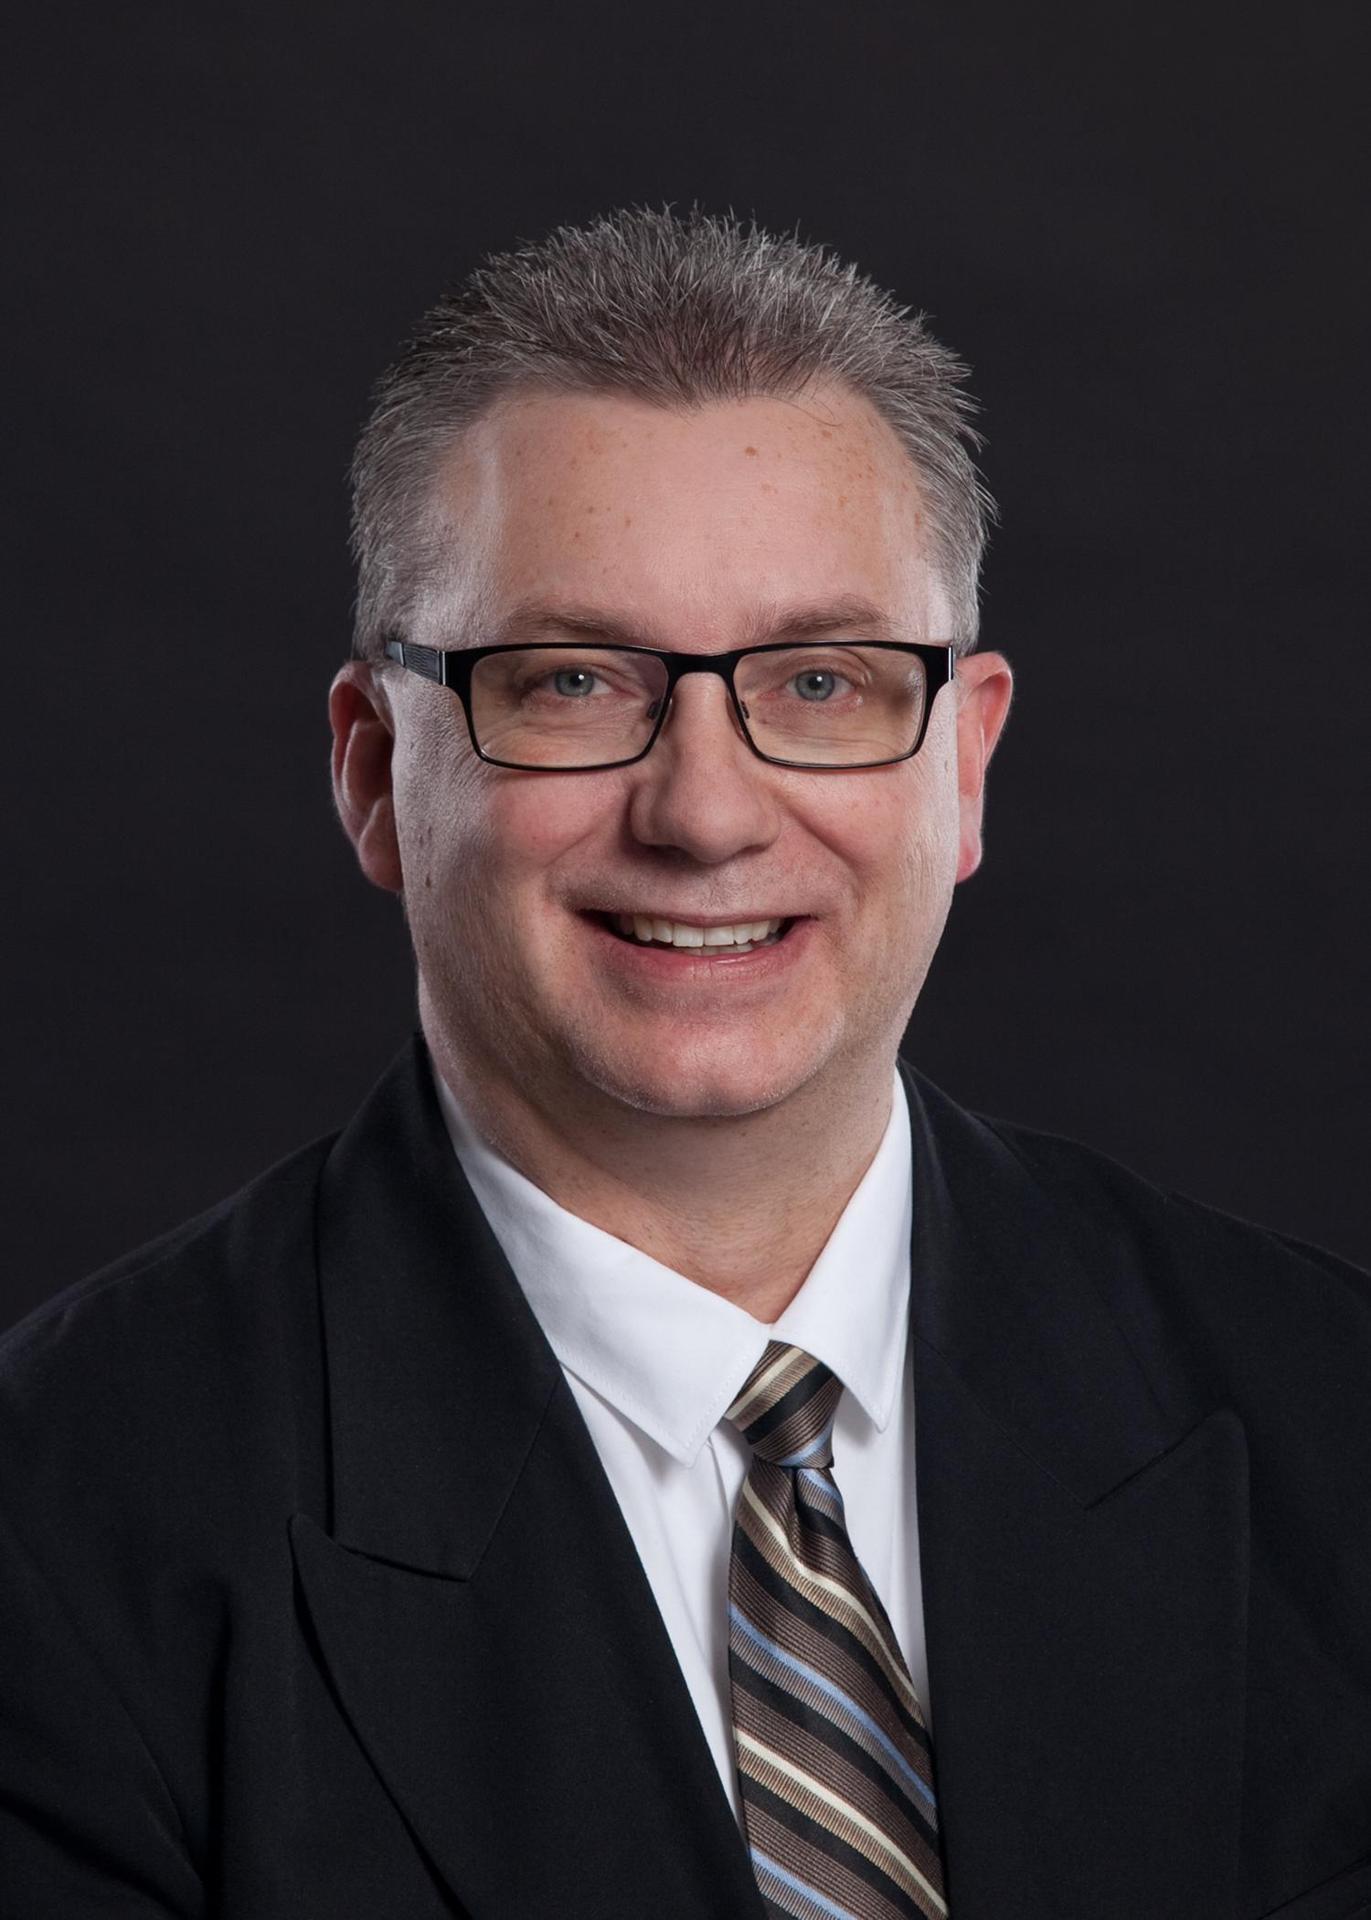 F. Martens, Trustee